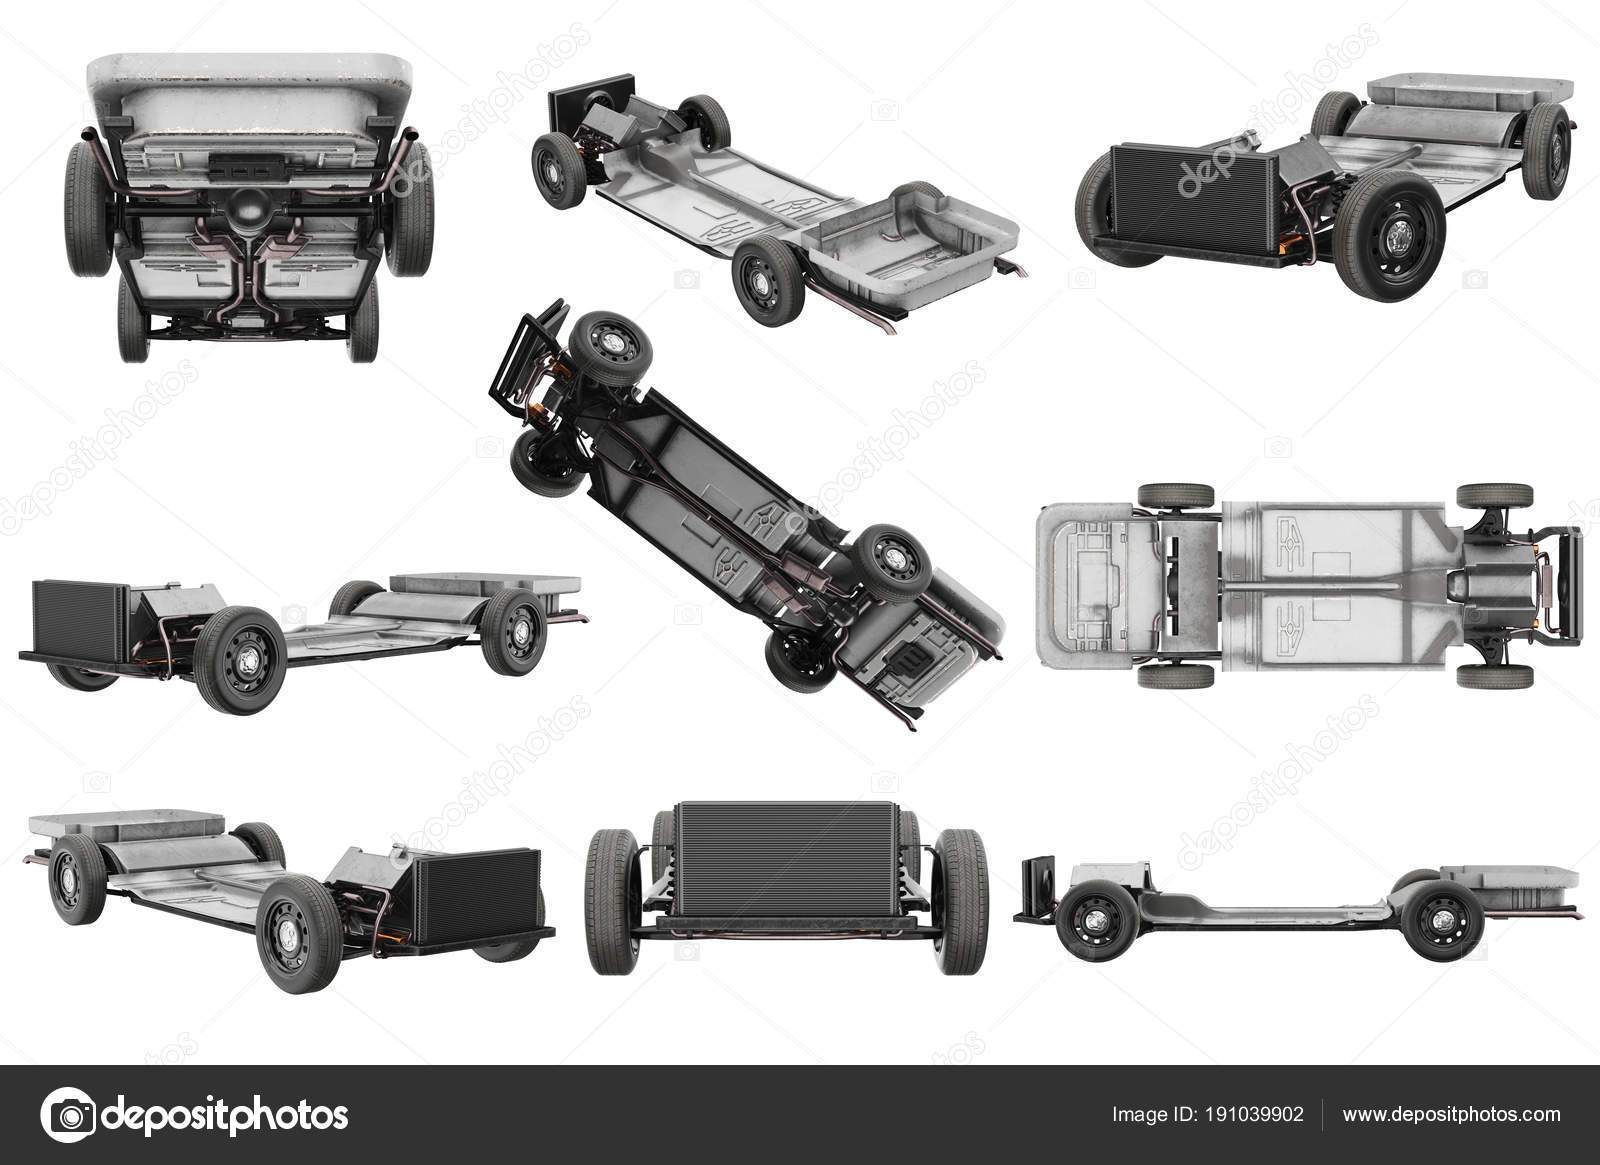 Chasis bastidor coche juego — Fotos de Stock © ARTYuSTUDIO #191039902